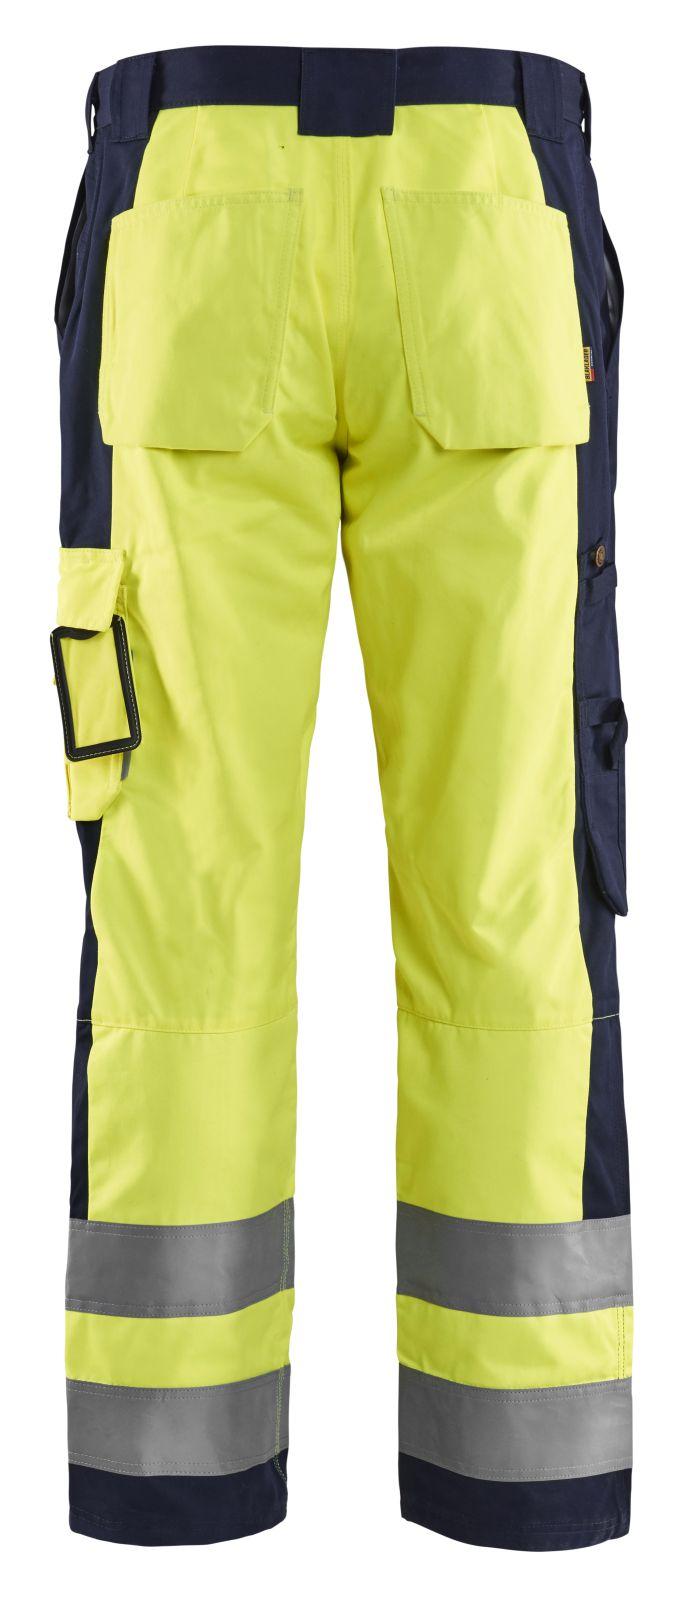 Blaklader Broeken 15831860 High Vis geel-marineblauw(3389)